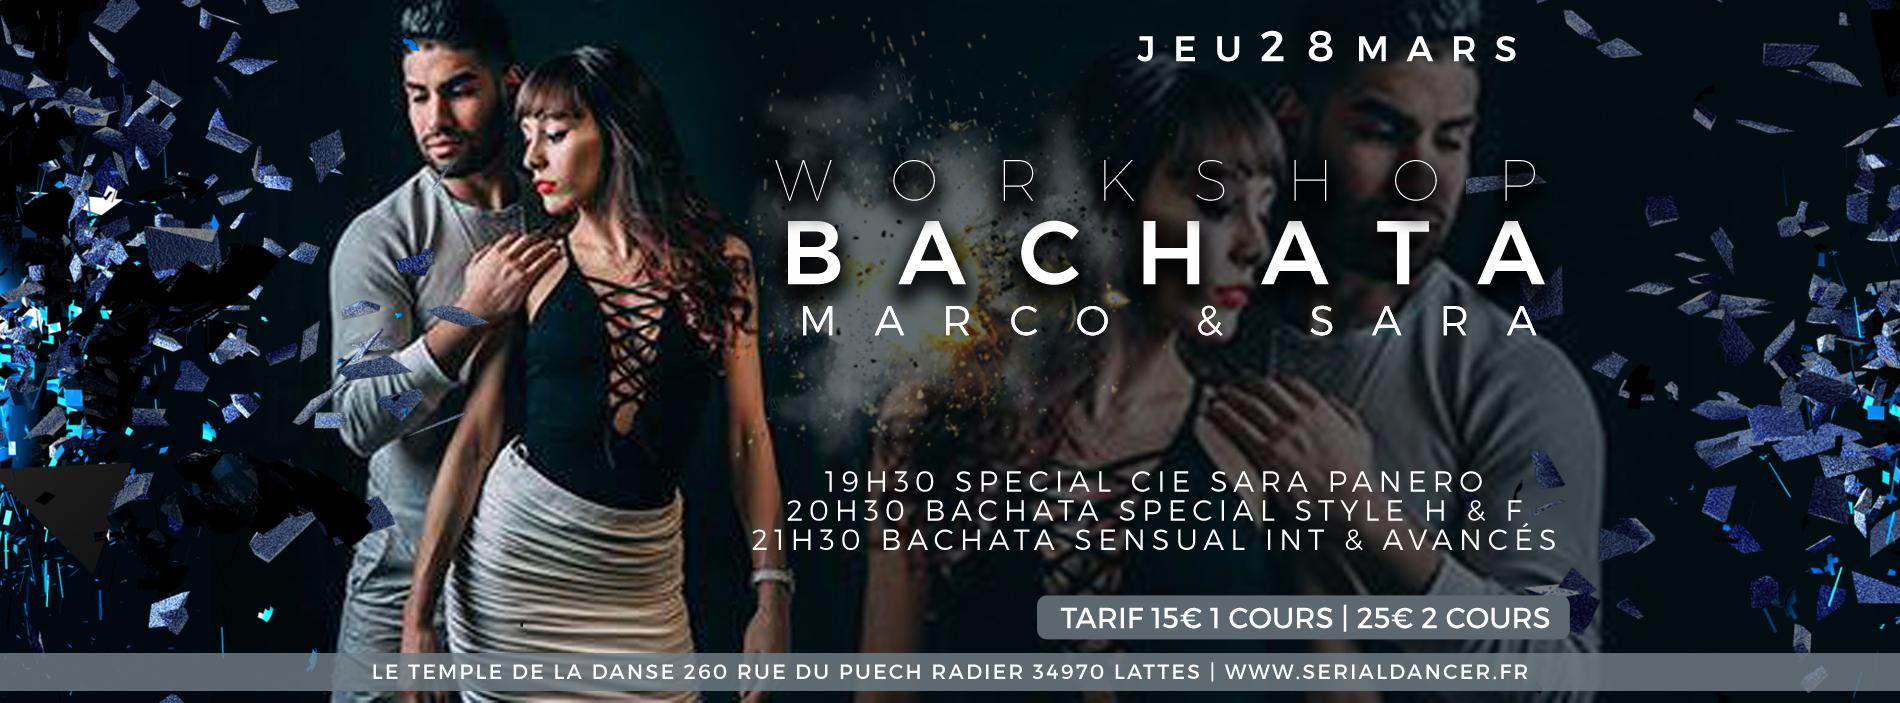 Jeu28mars – Stage Bachata – Marco & Sara